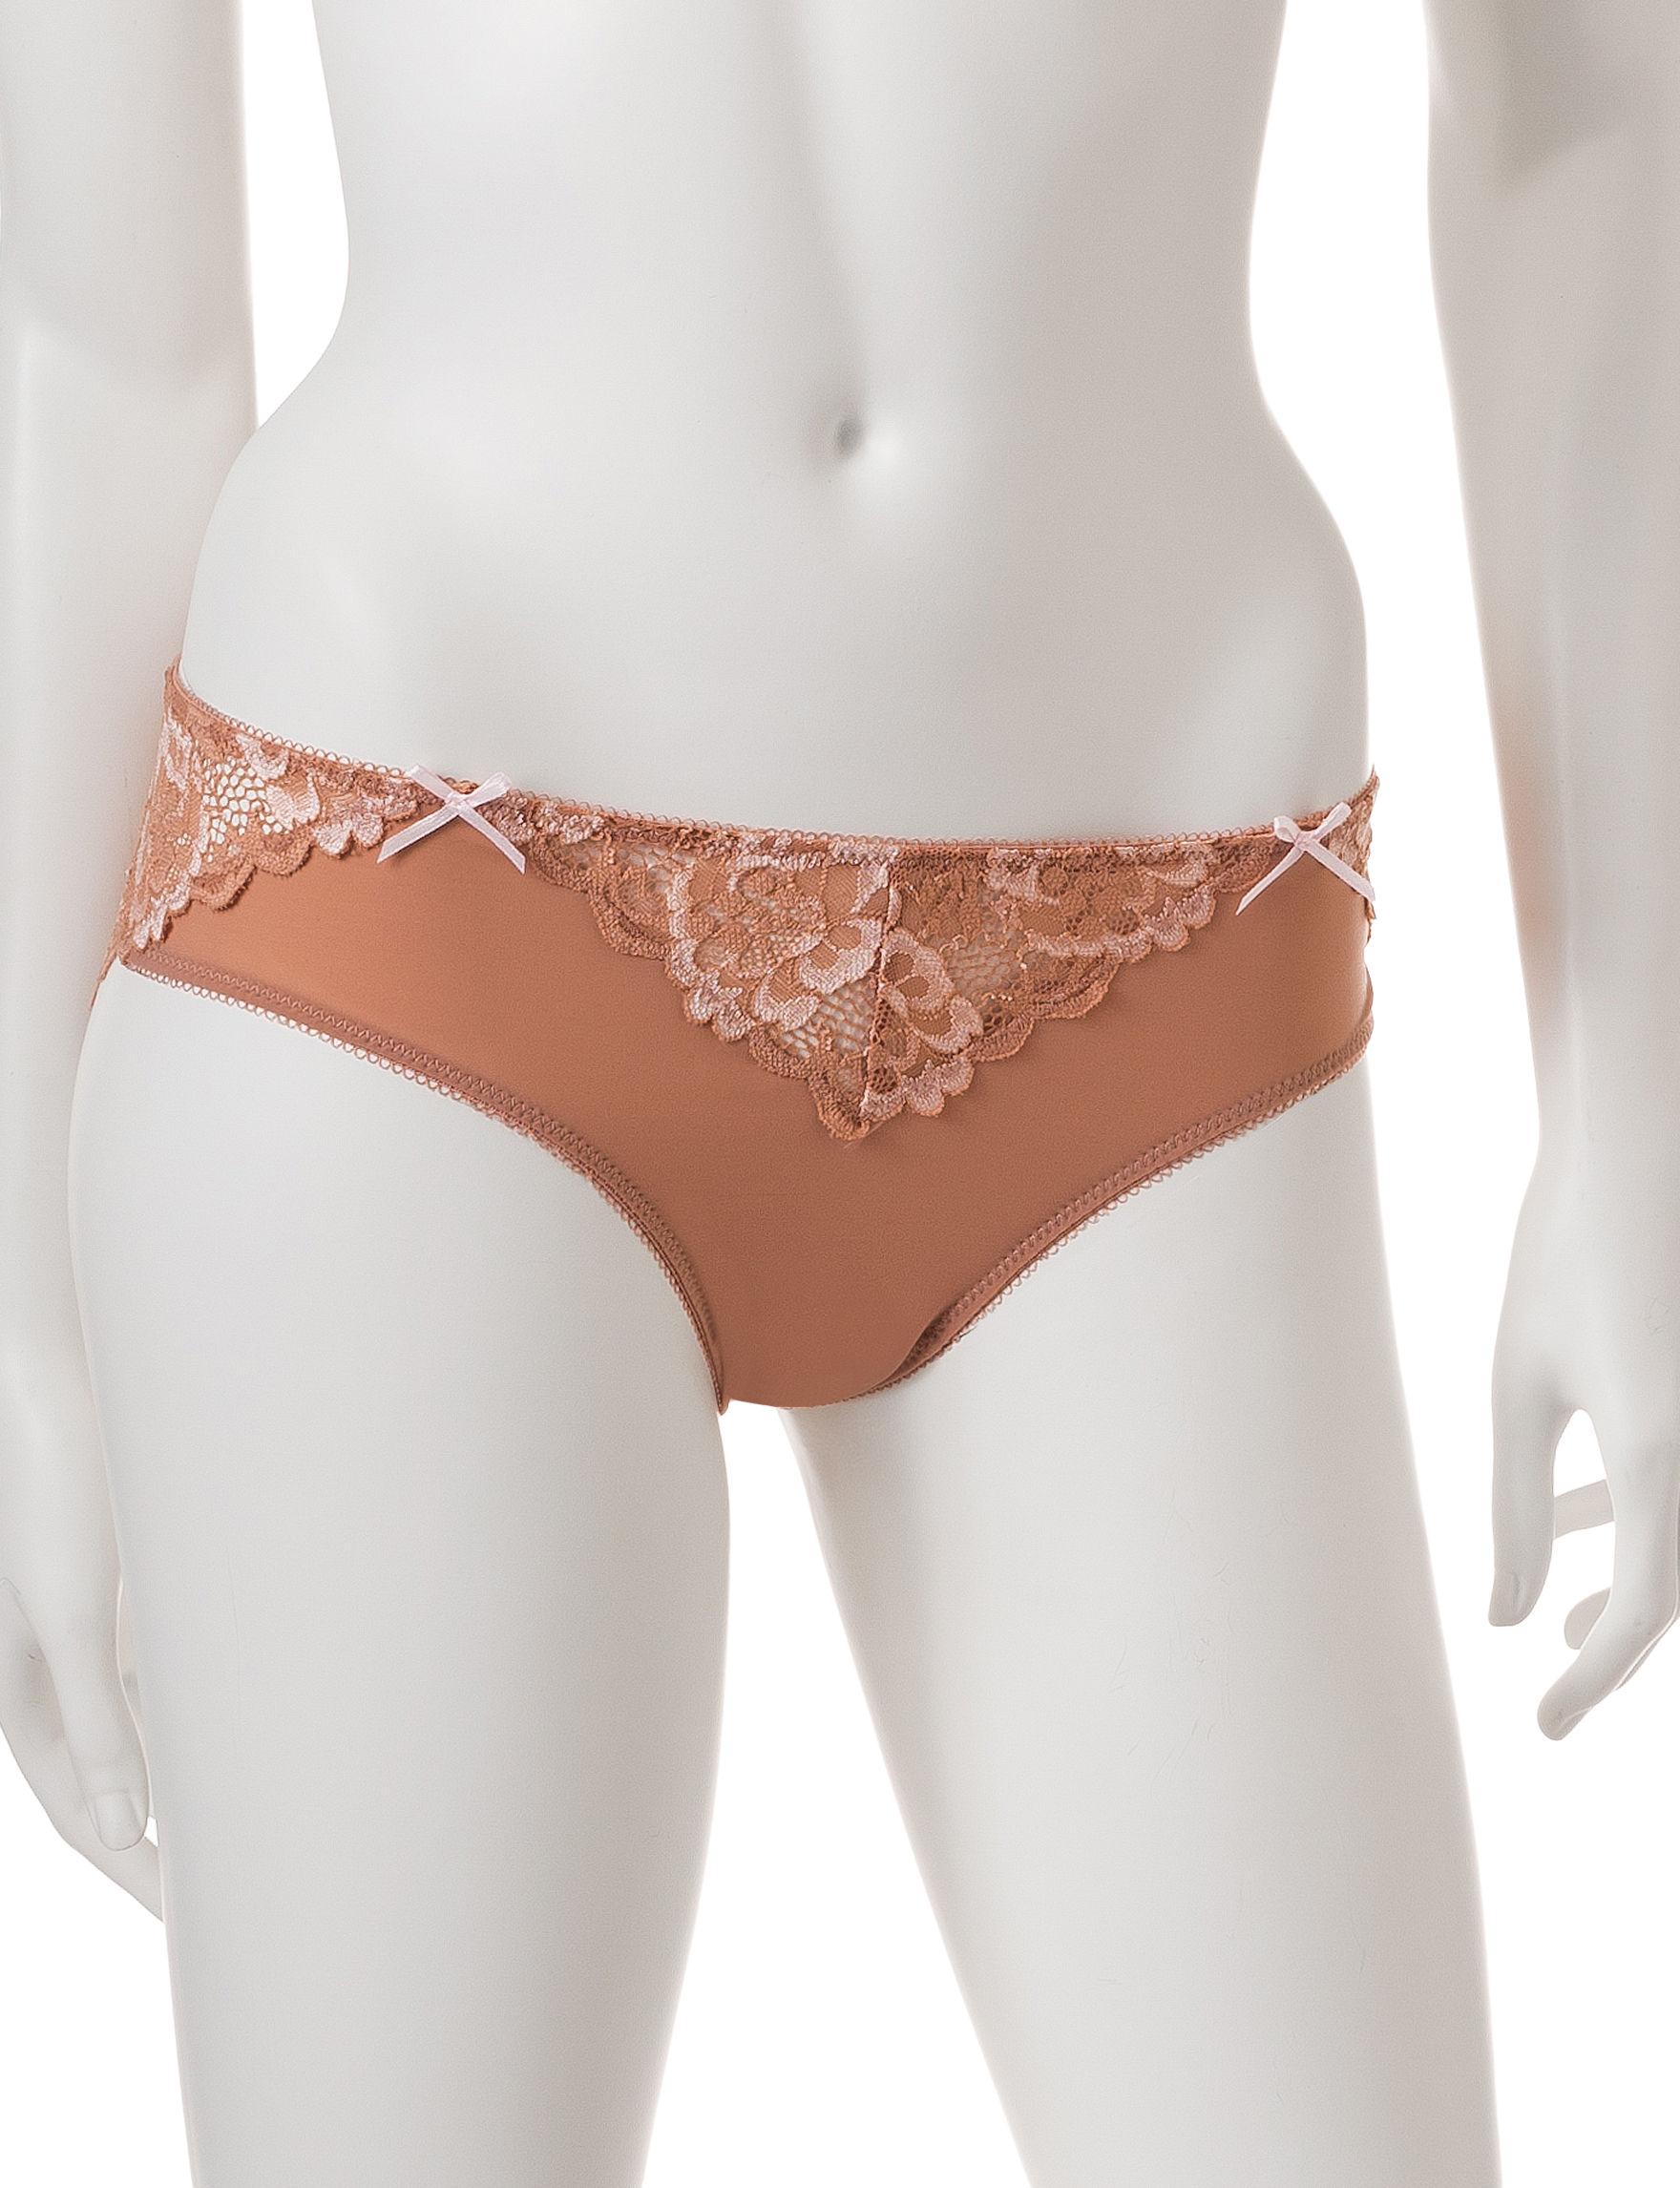 Rene Rofe Brown Panties High Cut